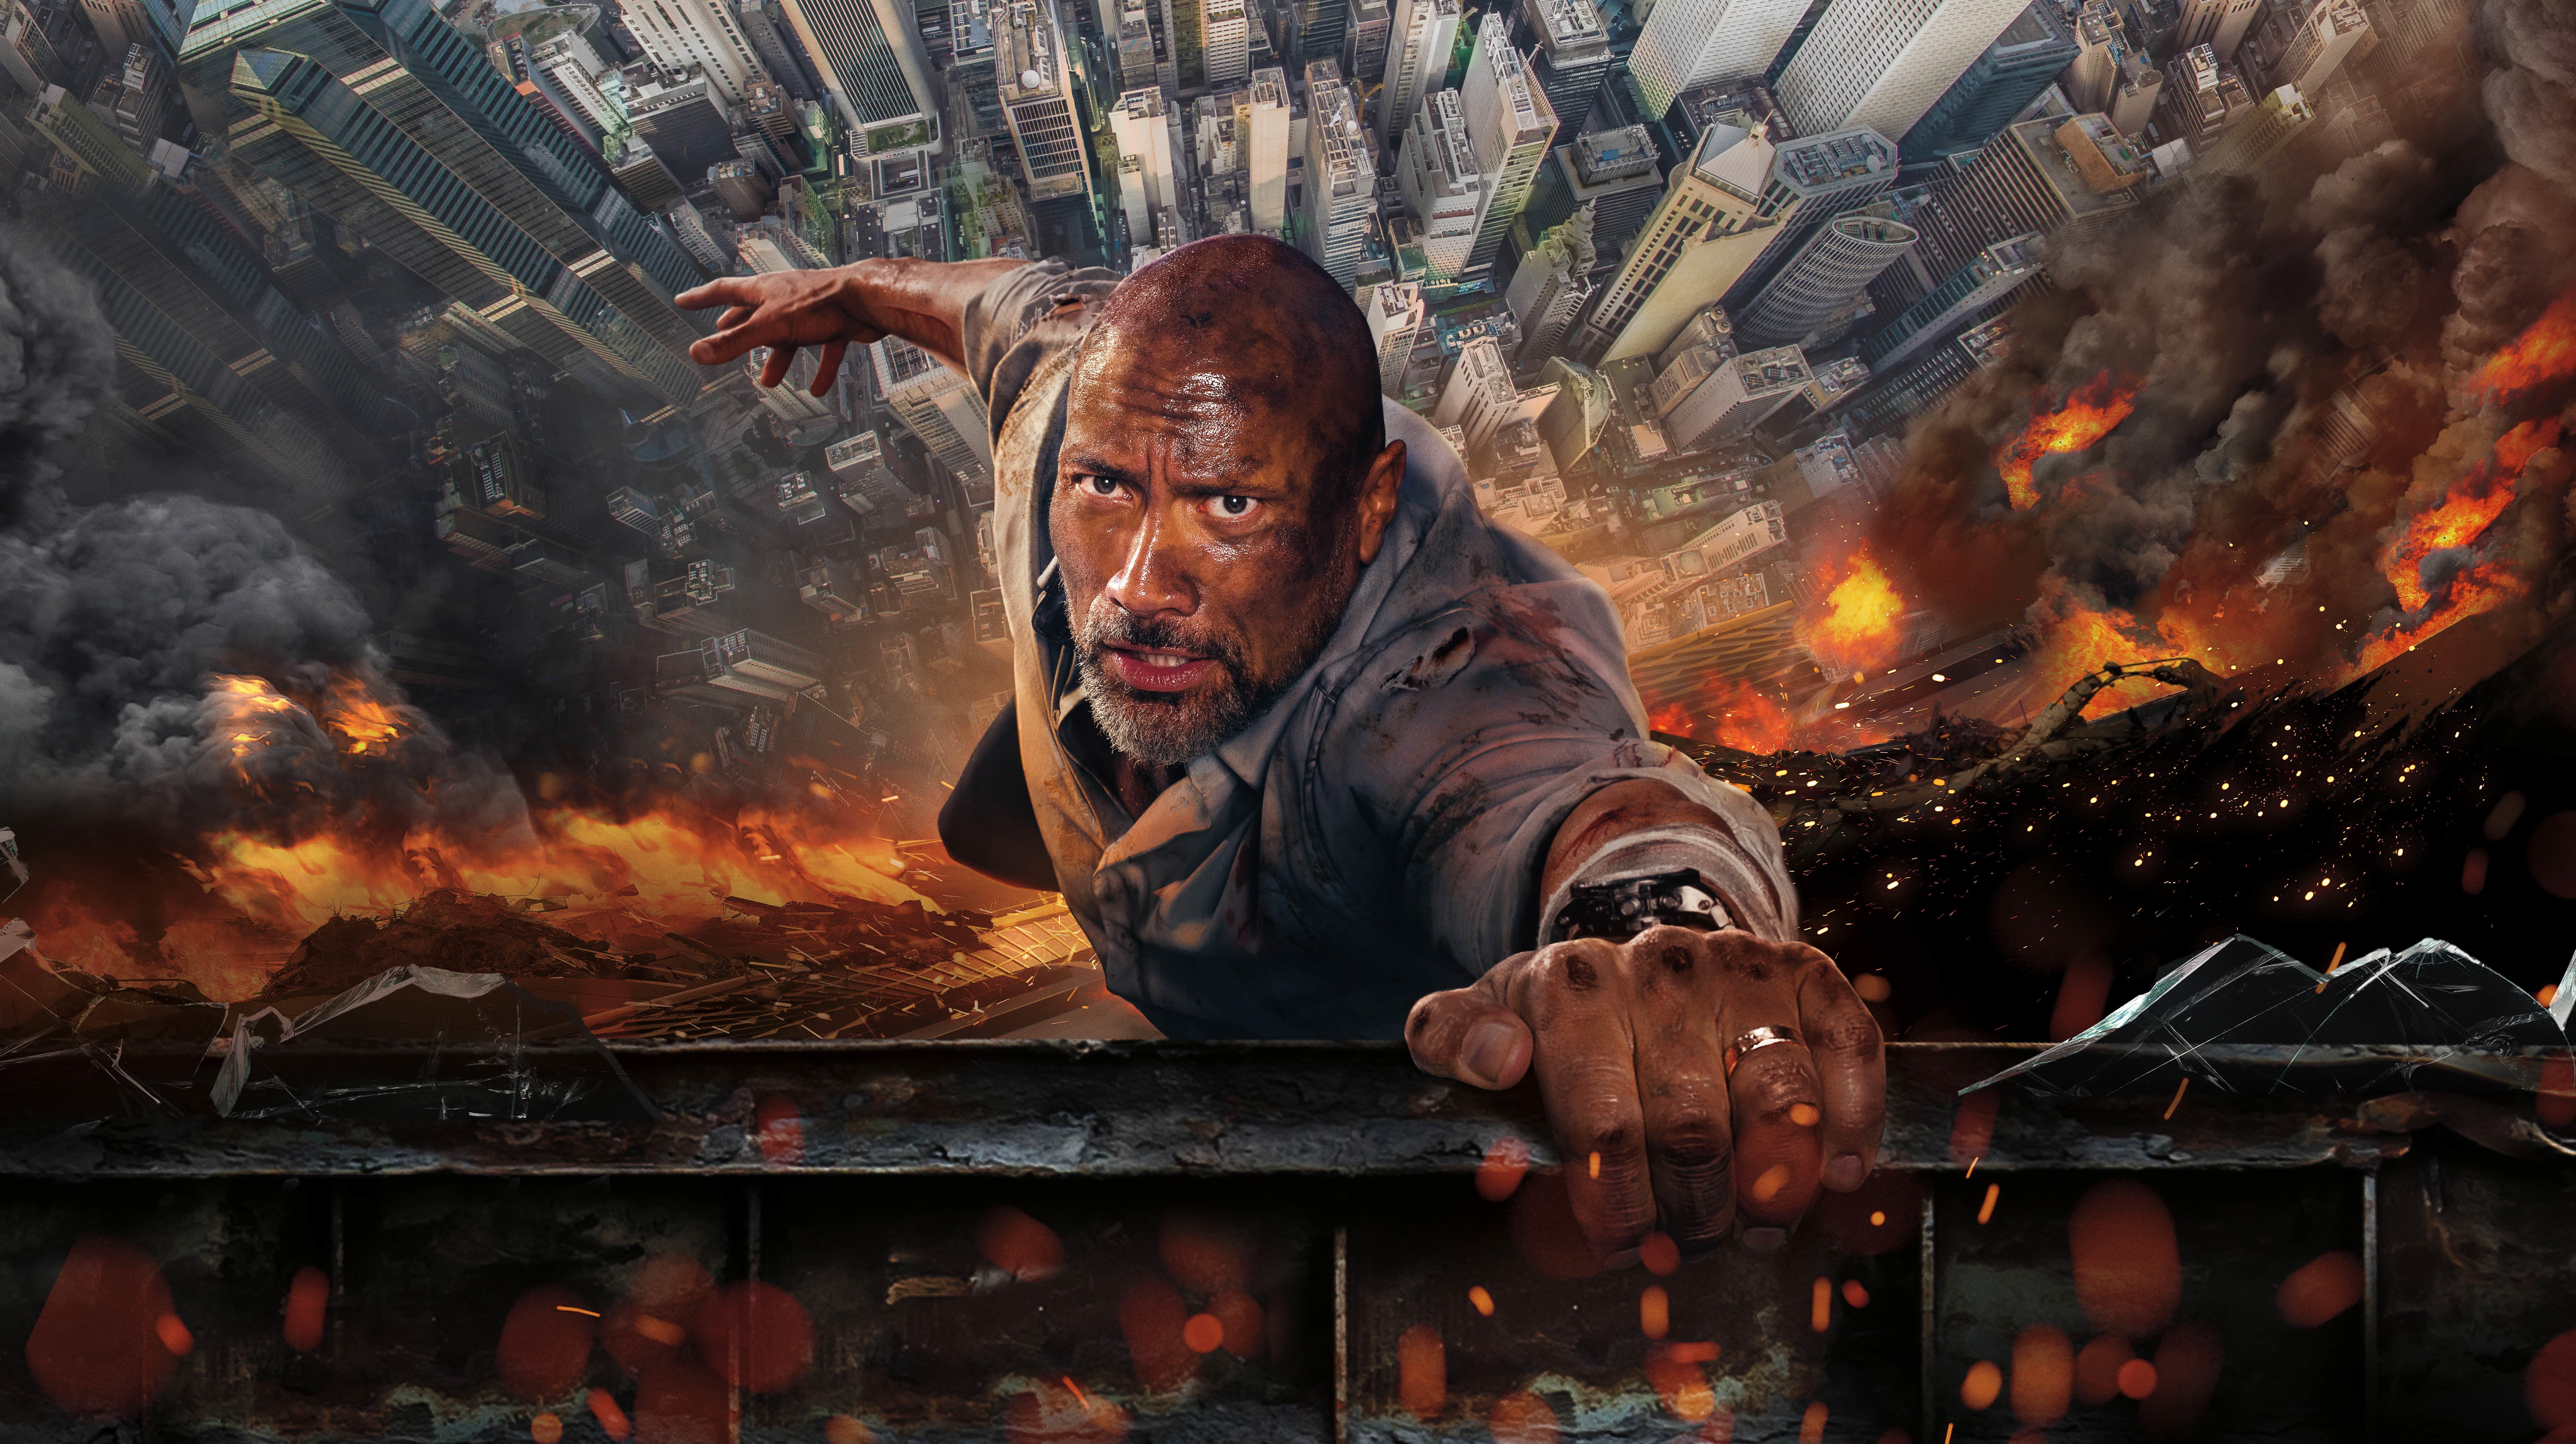 Skyscraper Dwayne Johnson 2018 Movie Wallpaper Hd Movies 4k